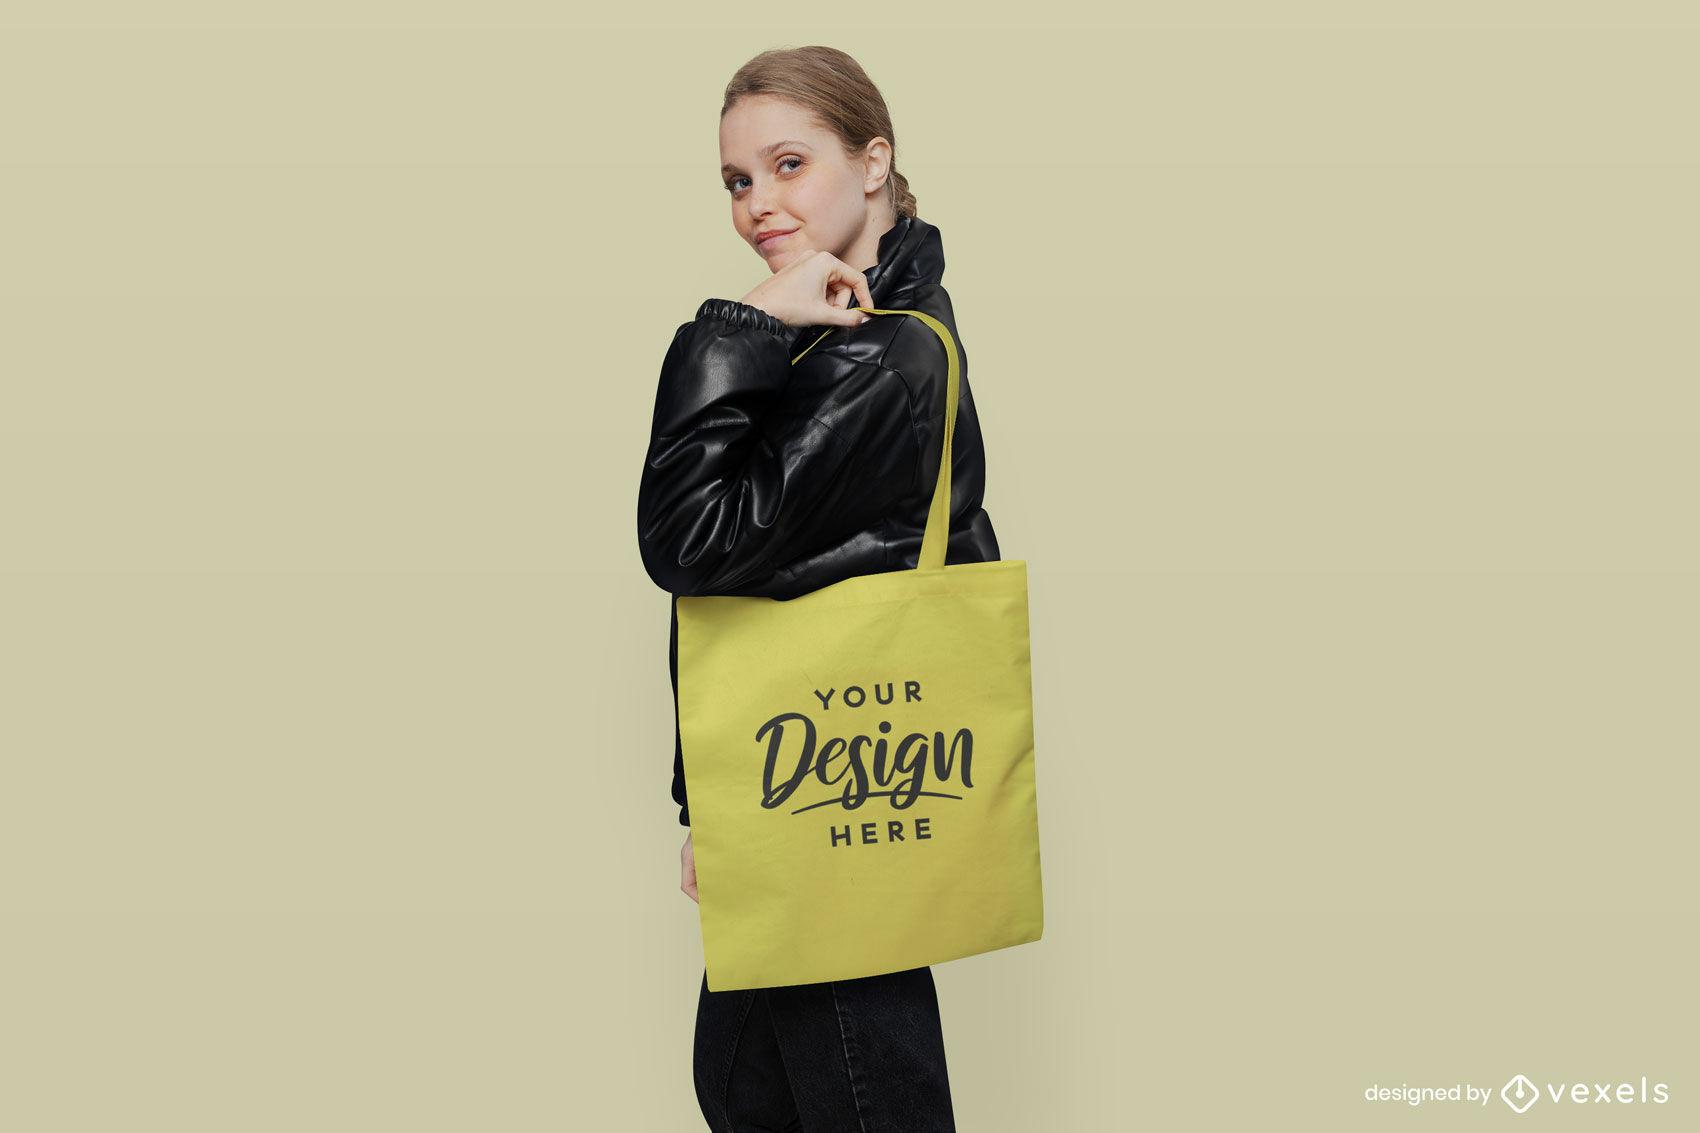 Yellow tote bag girl in black jacket mockup